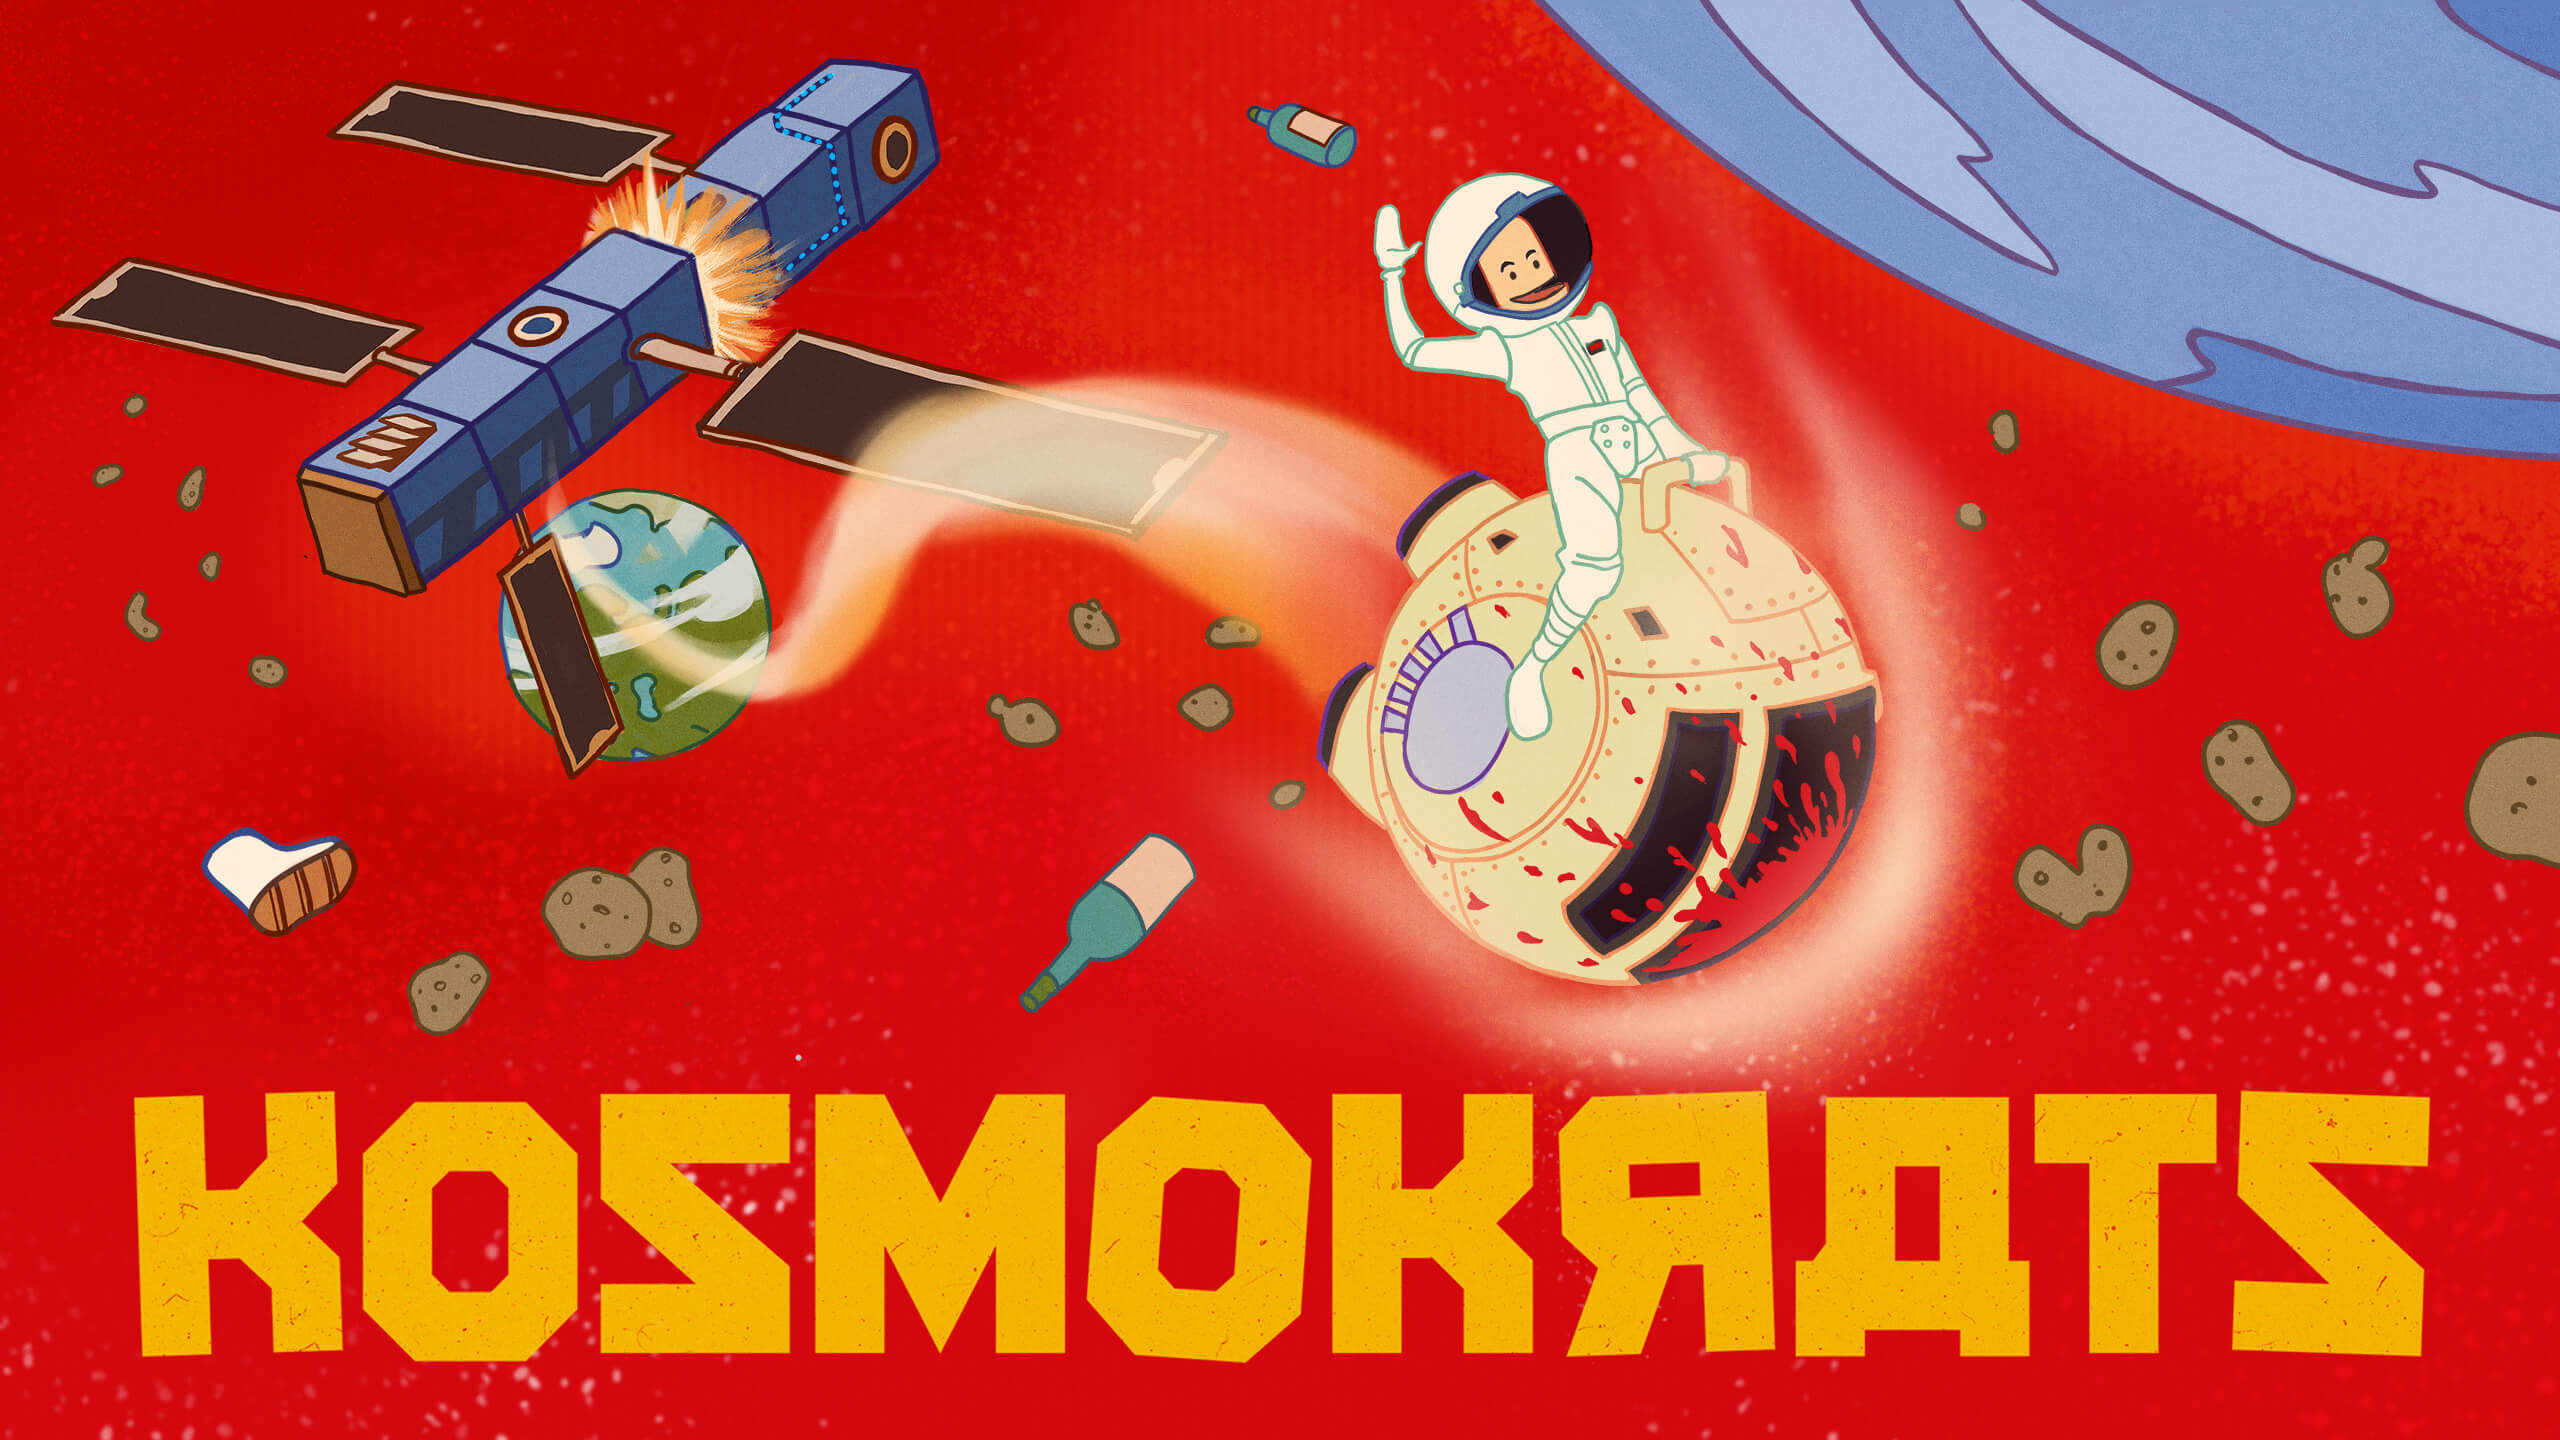 kosmokrats插图5